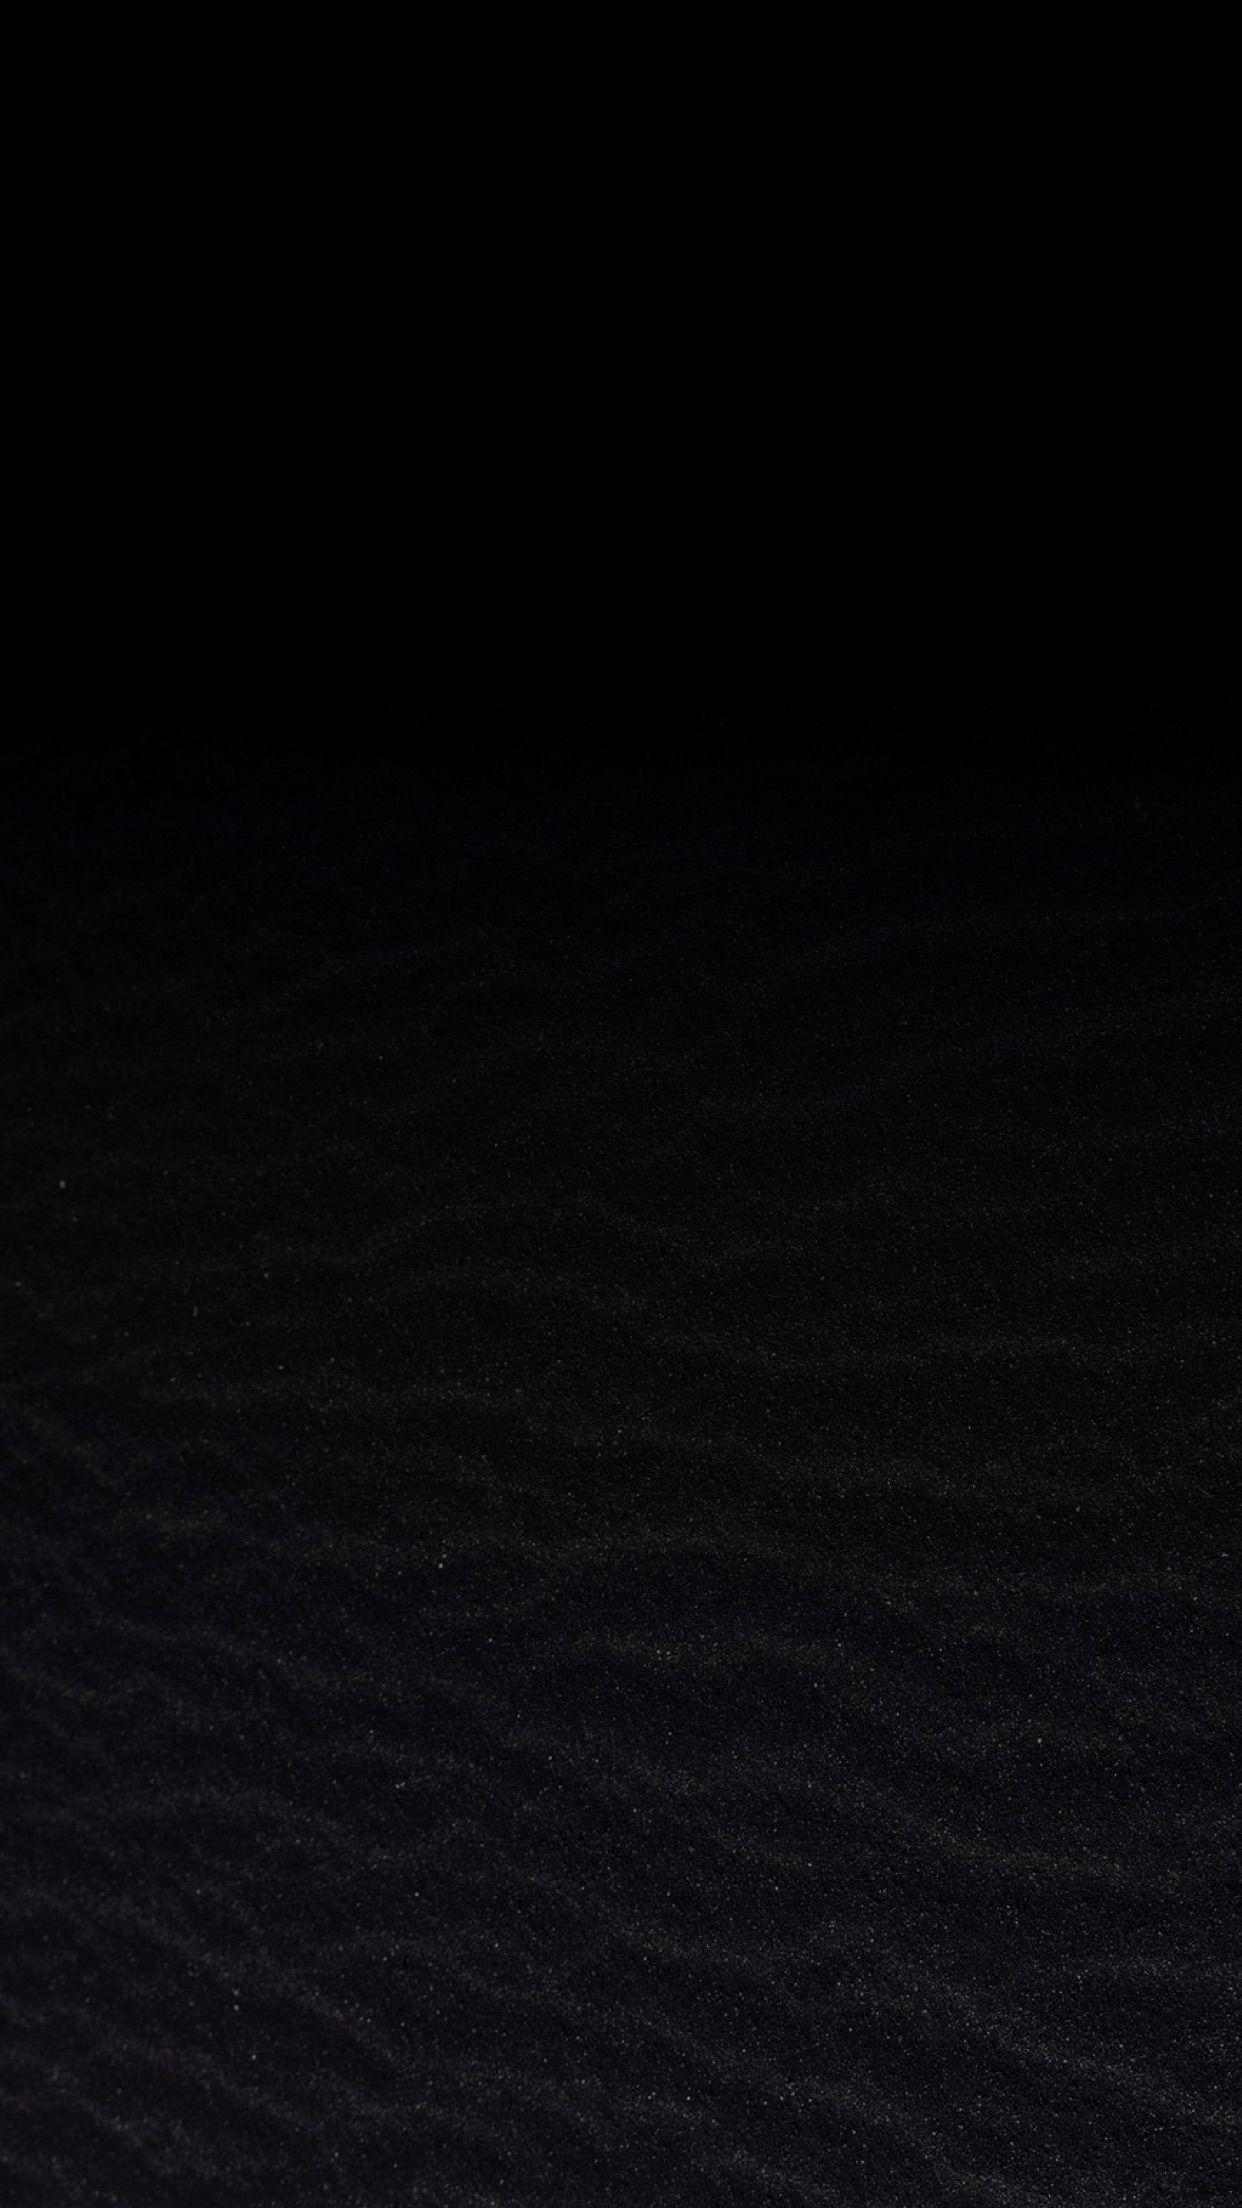 Black Sand Wallpapers - Top Free Black ...